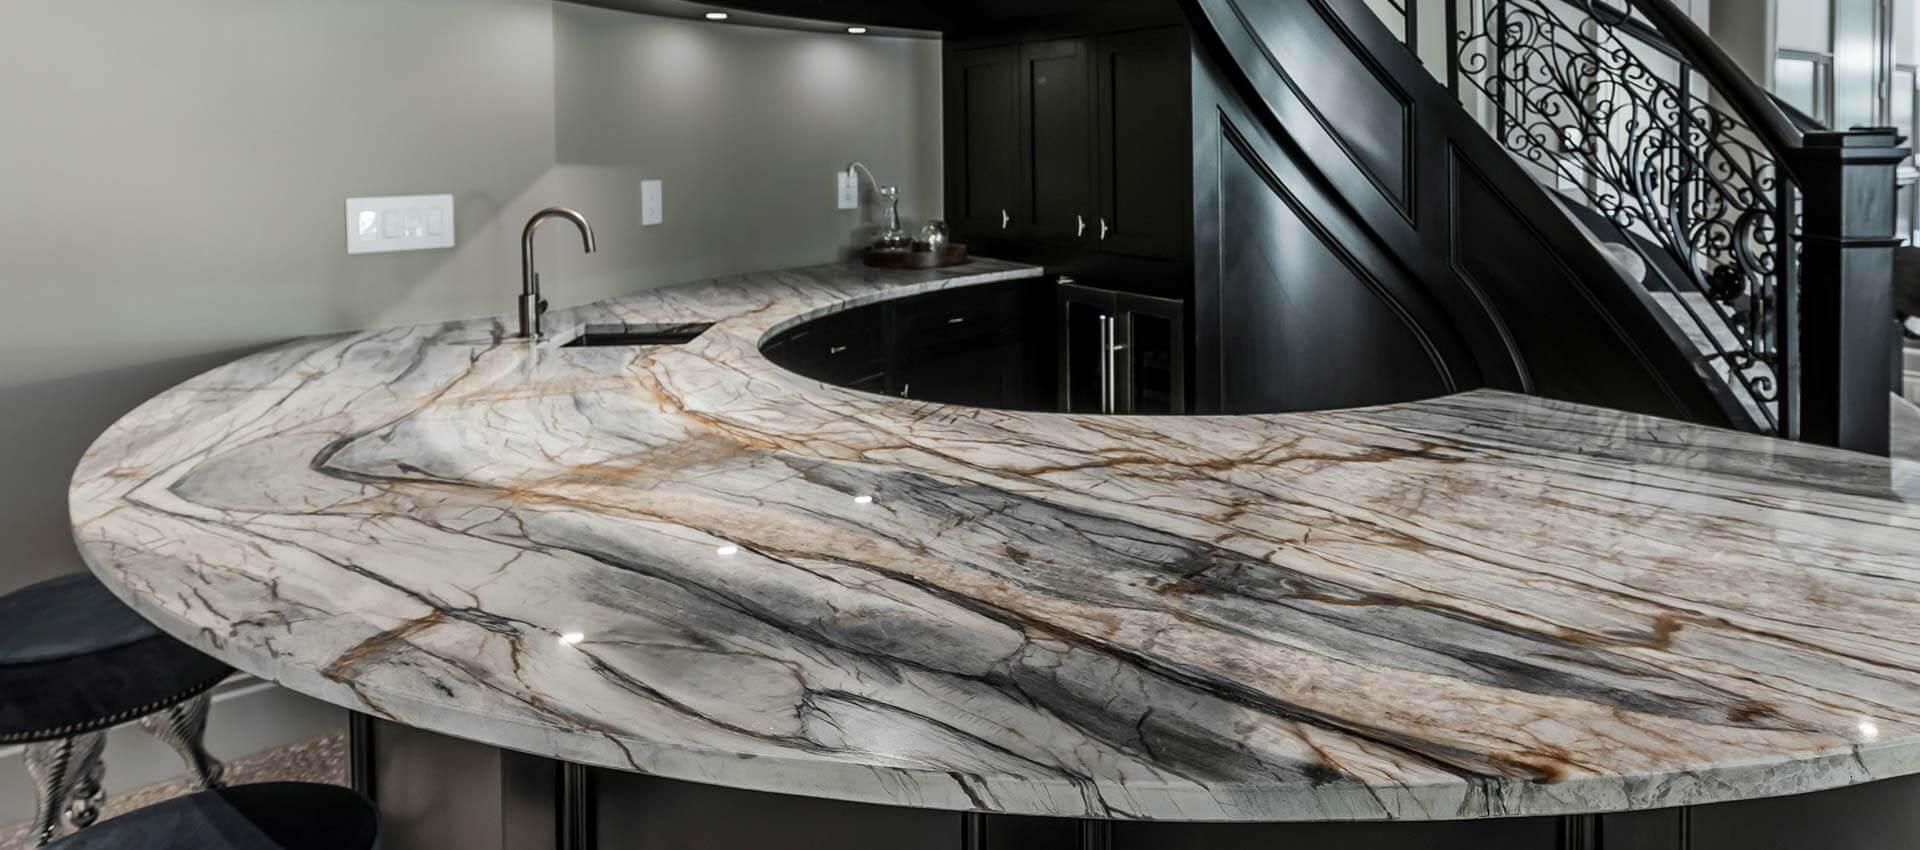 Custom Countertops In Ohio Distinctive Marble And Granite